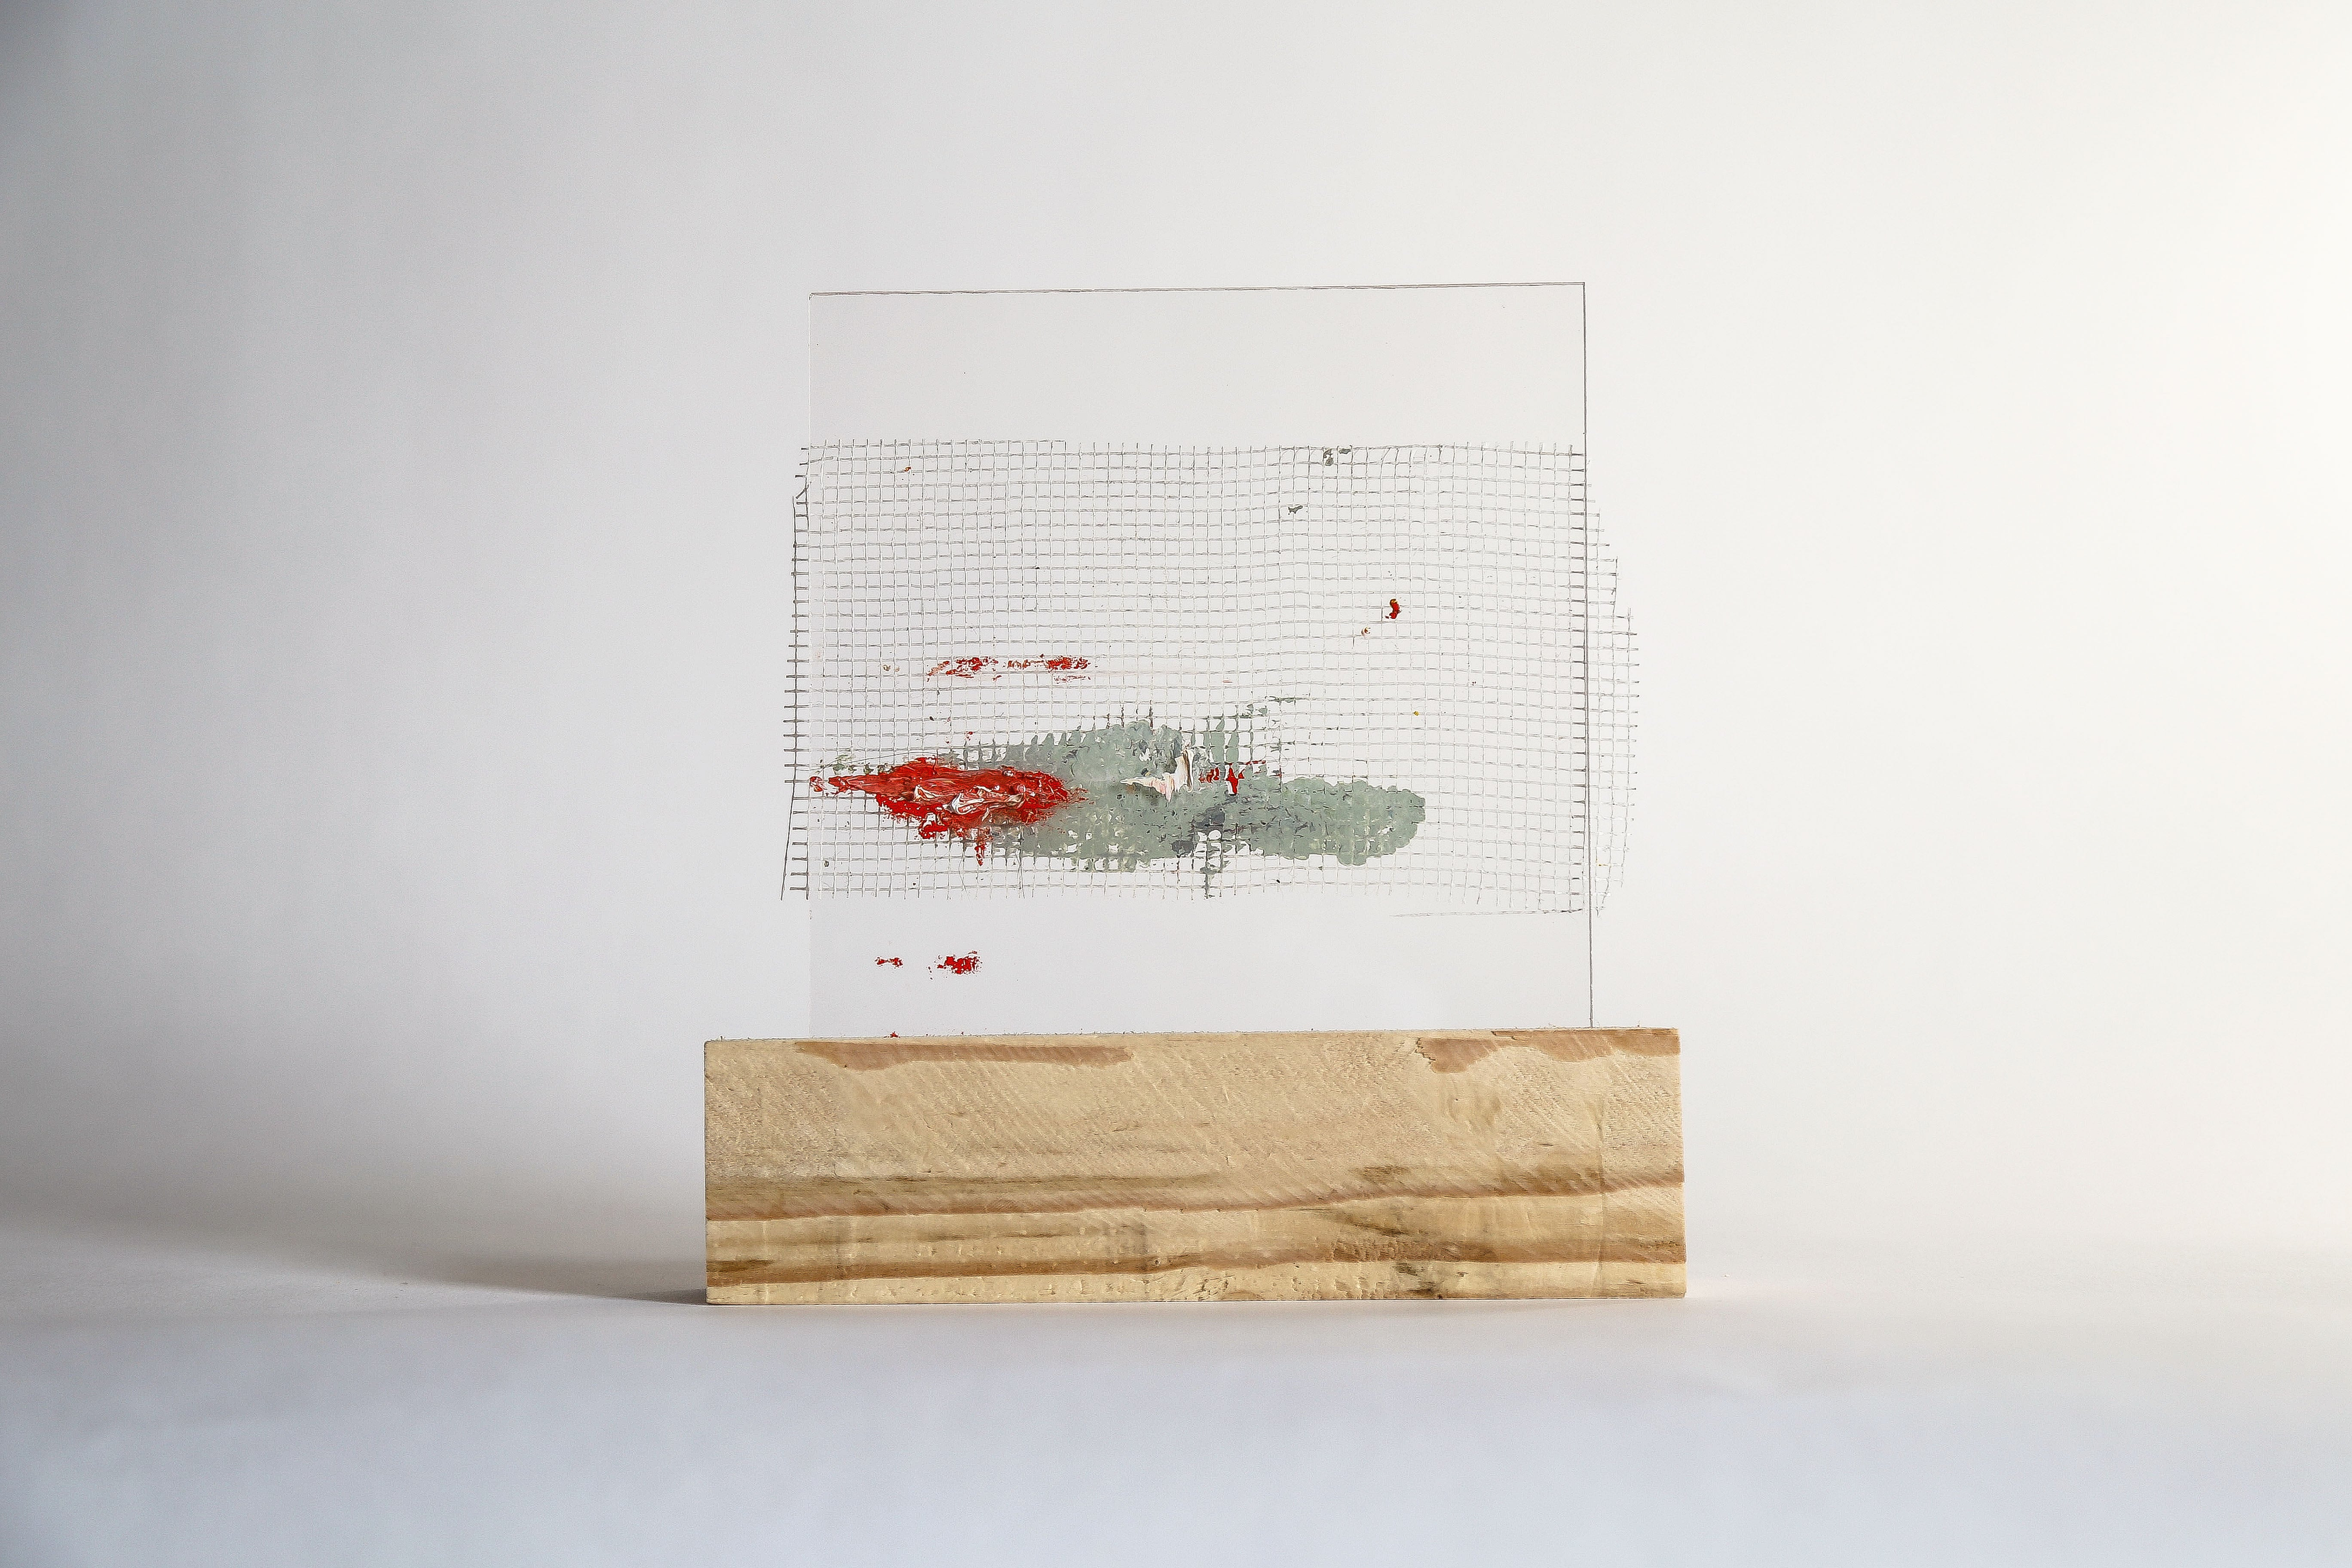 Lourdes Rivera, Retrospect 7, 2015, Plexiglass, Wood, Oil Paint